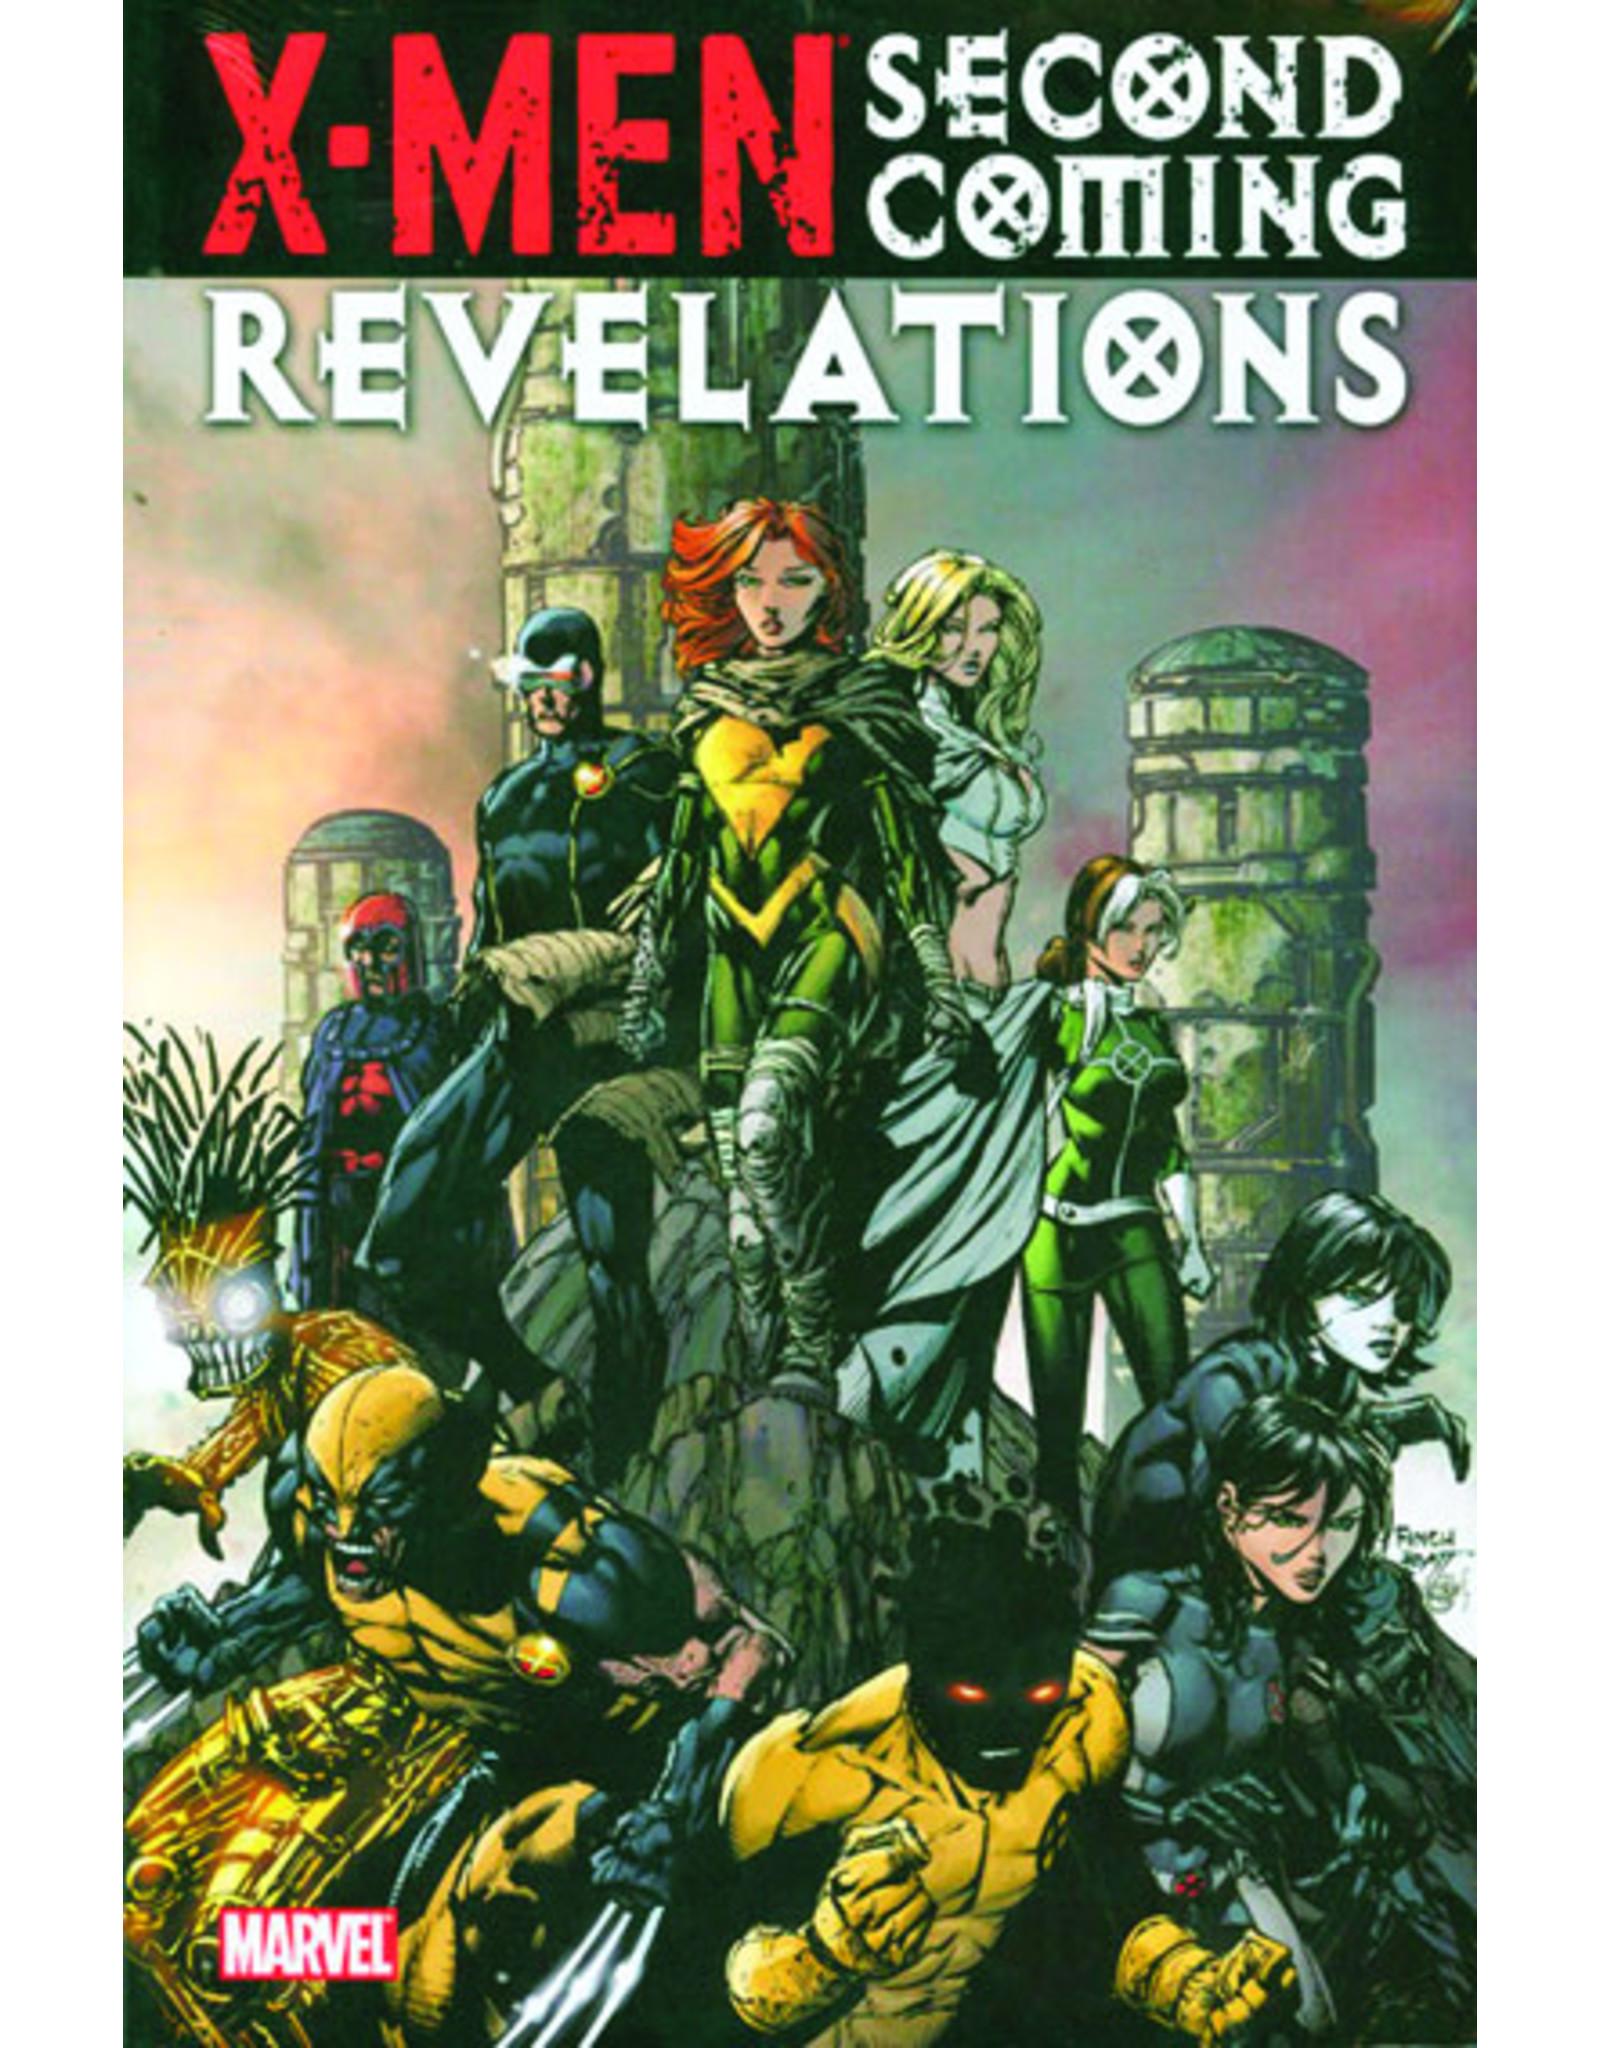 MARVEL COMICS X-MEN SECOND COMING REVELATIONS HC